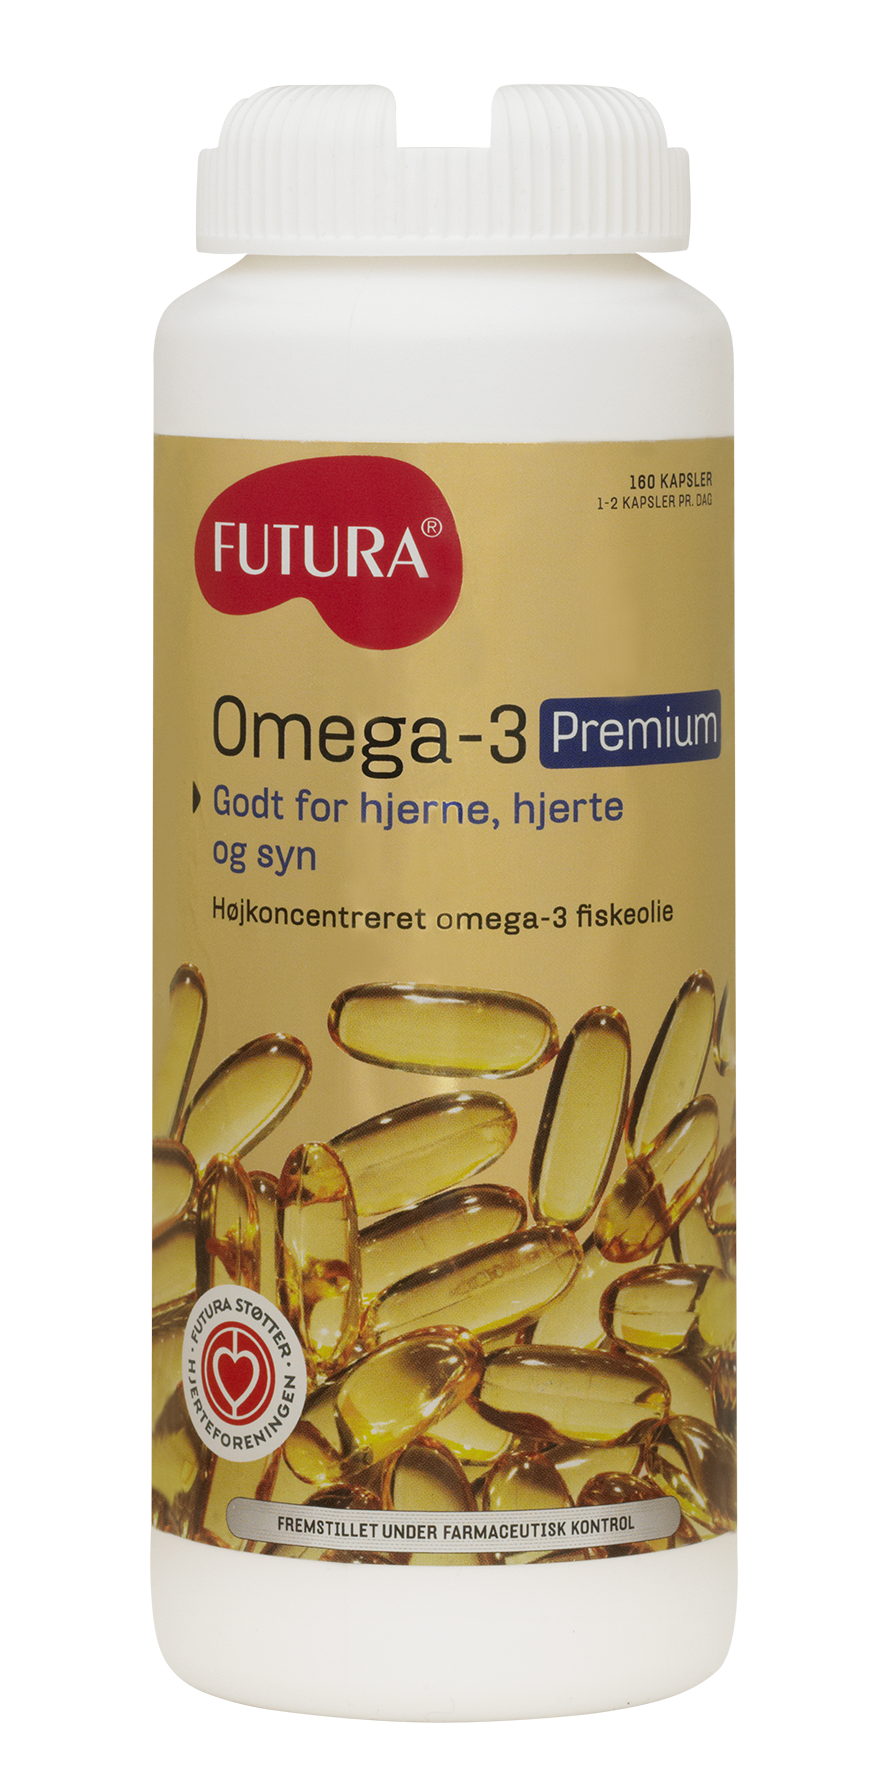 Omega-3 Premium Futura - 160 kapsler